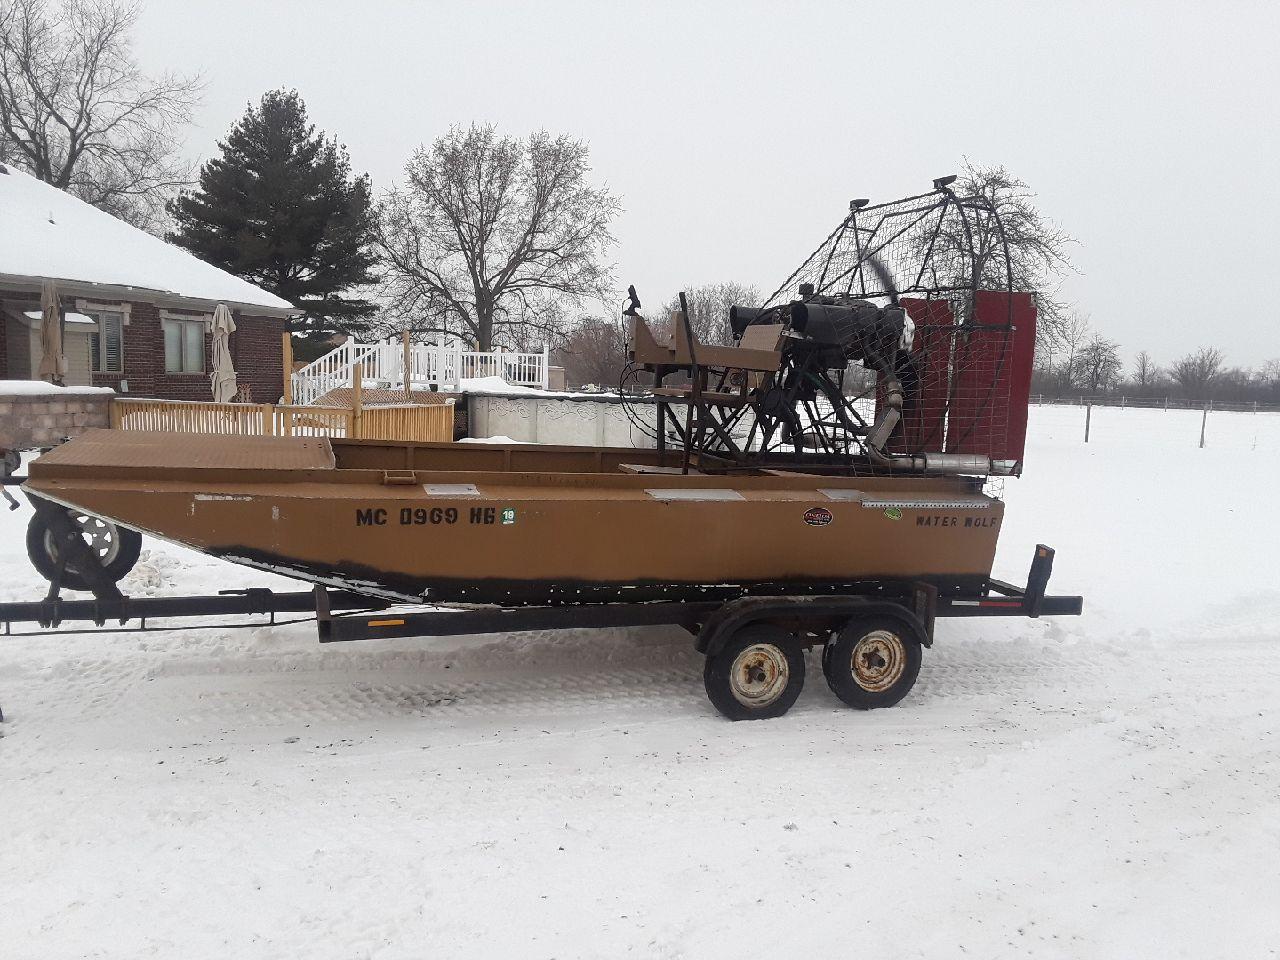 Air boat   Michigan Sportsman - Online Michigan Hunting and Fishing